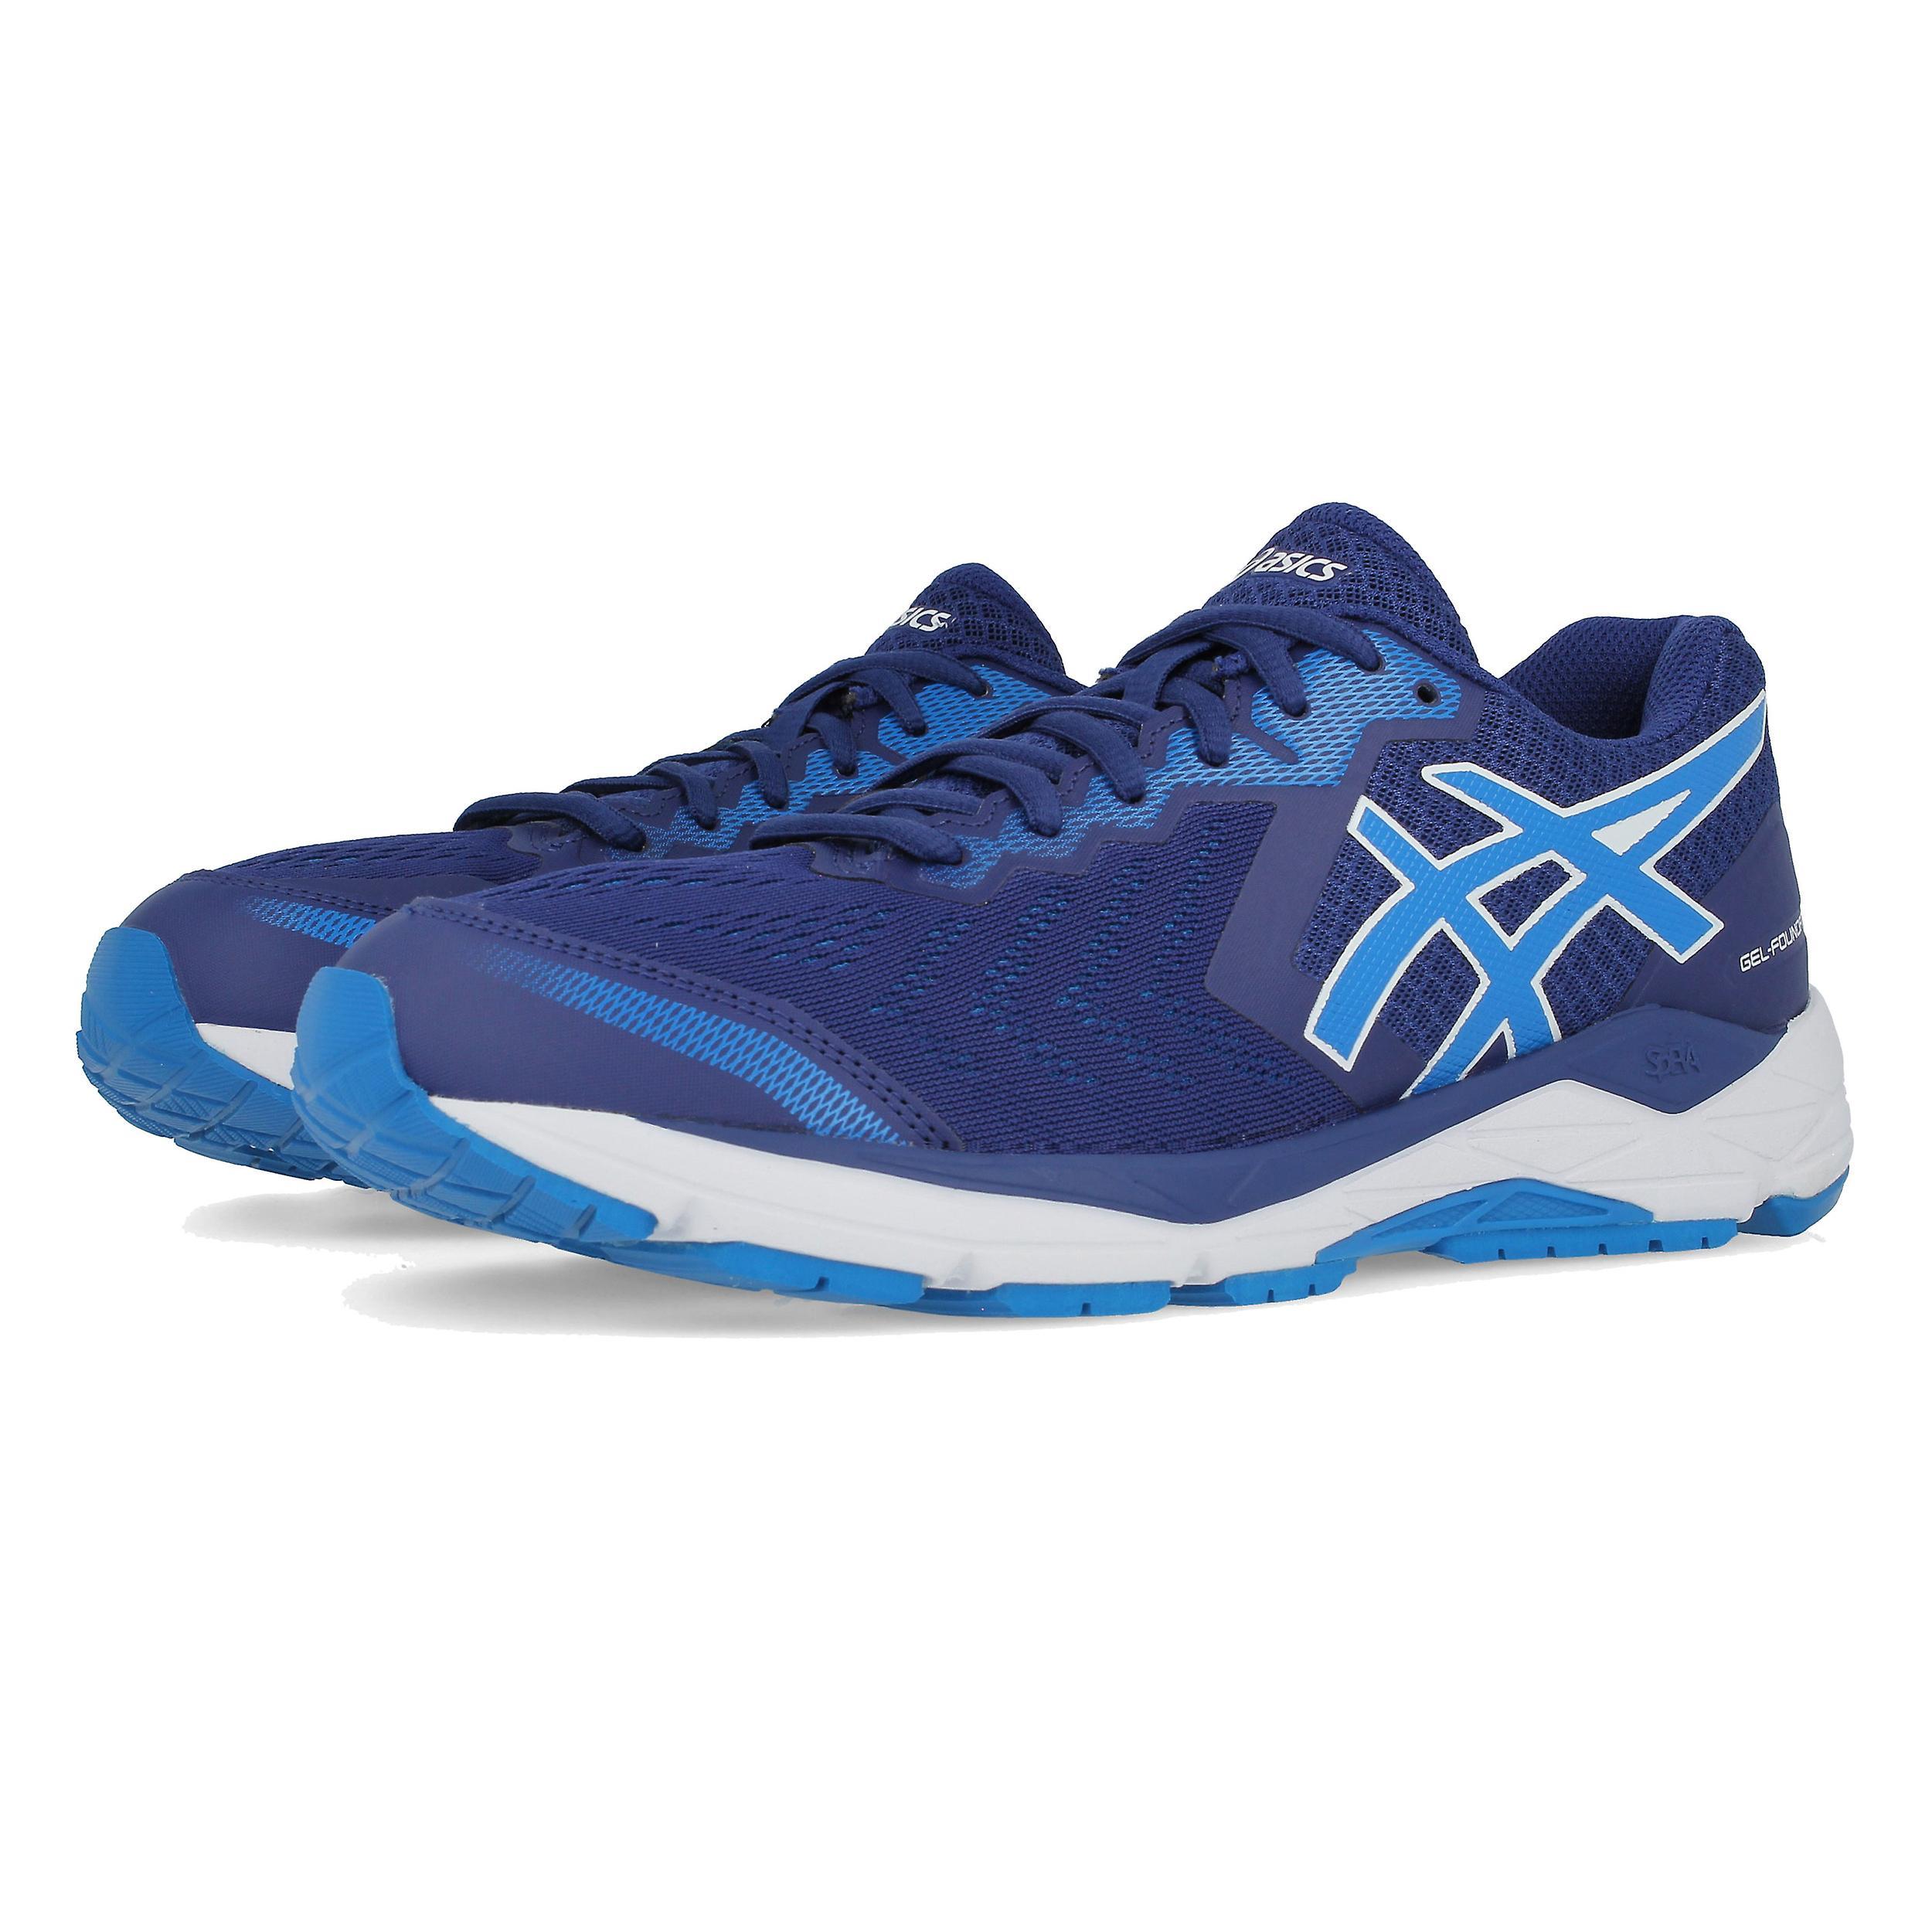 Asics Gel-Foundation 13 Running Shoes (2E Breite)-AW19